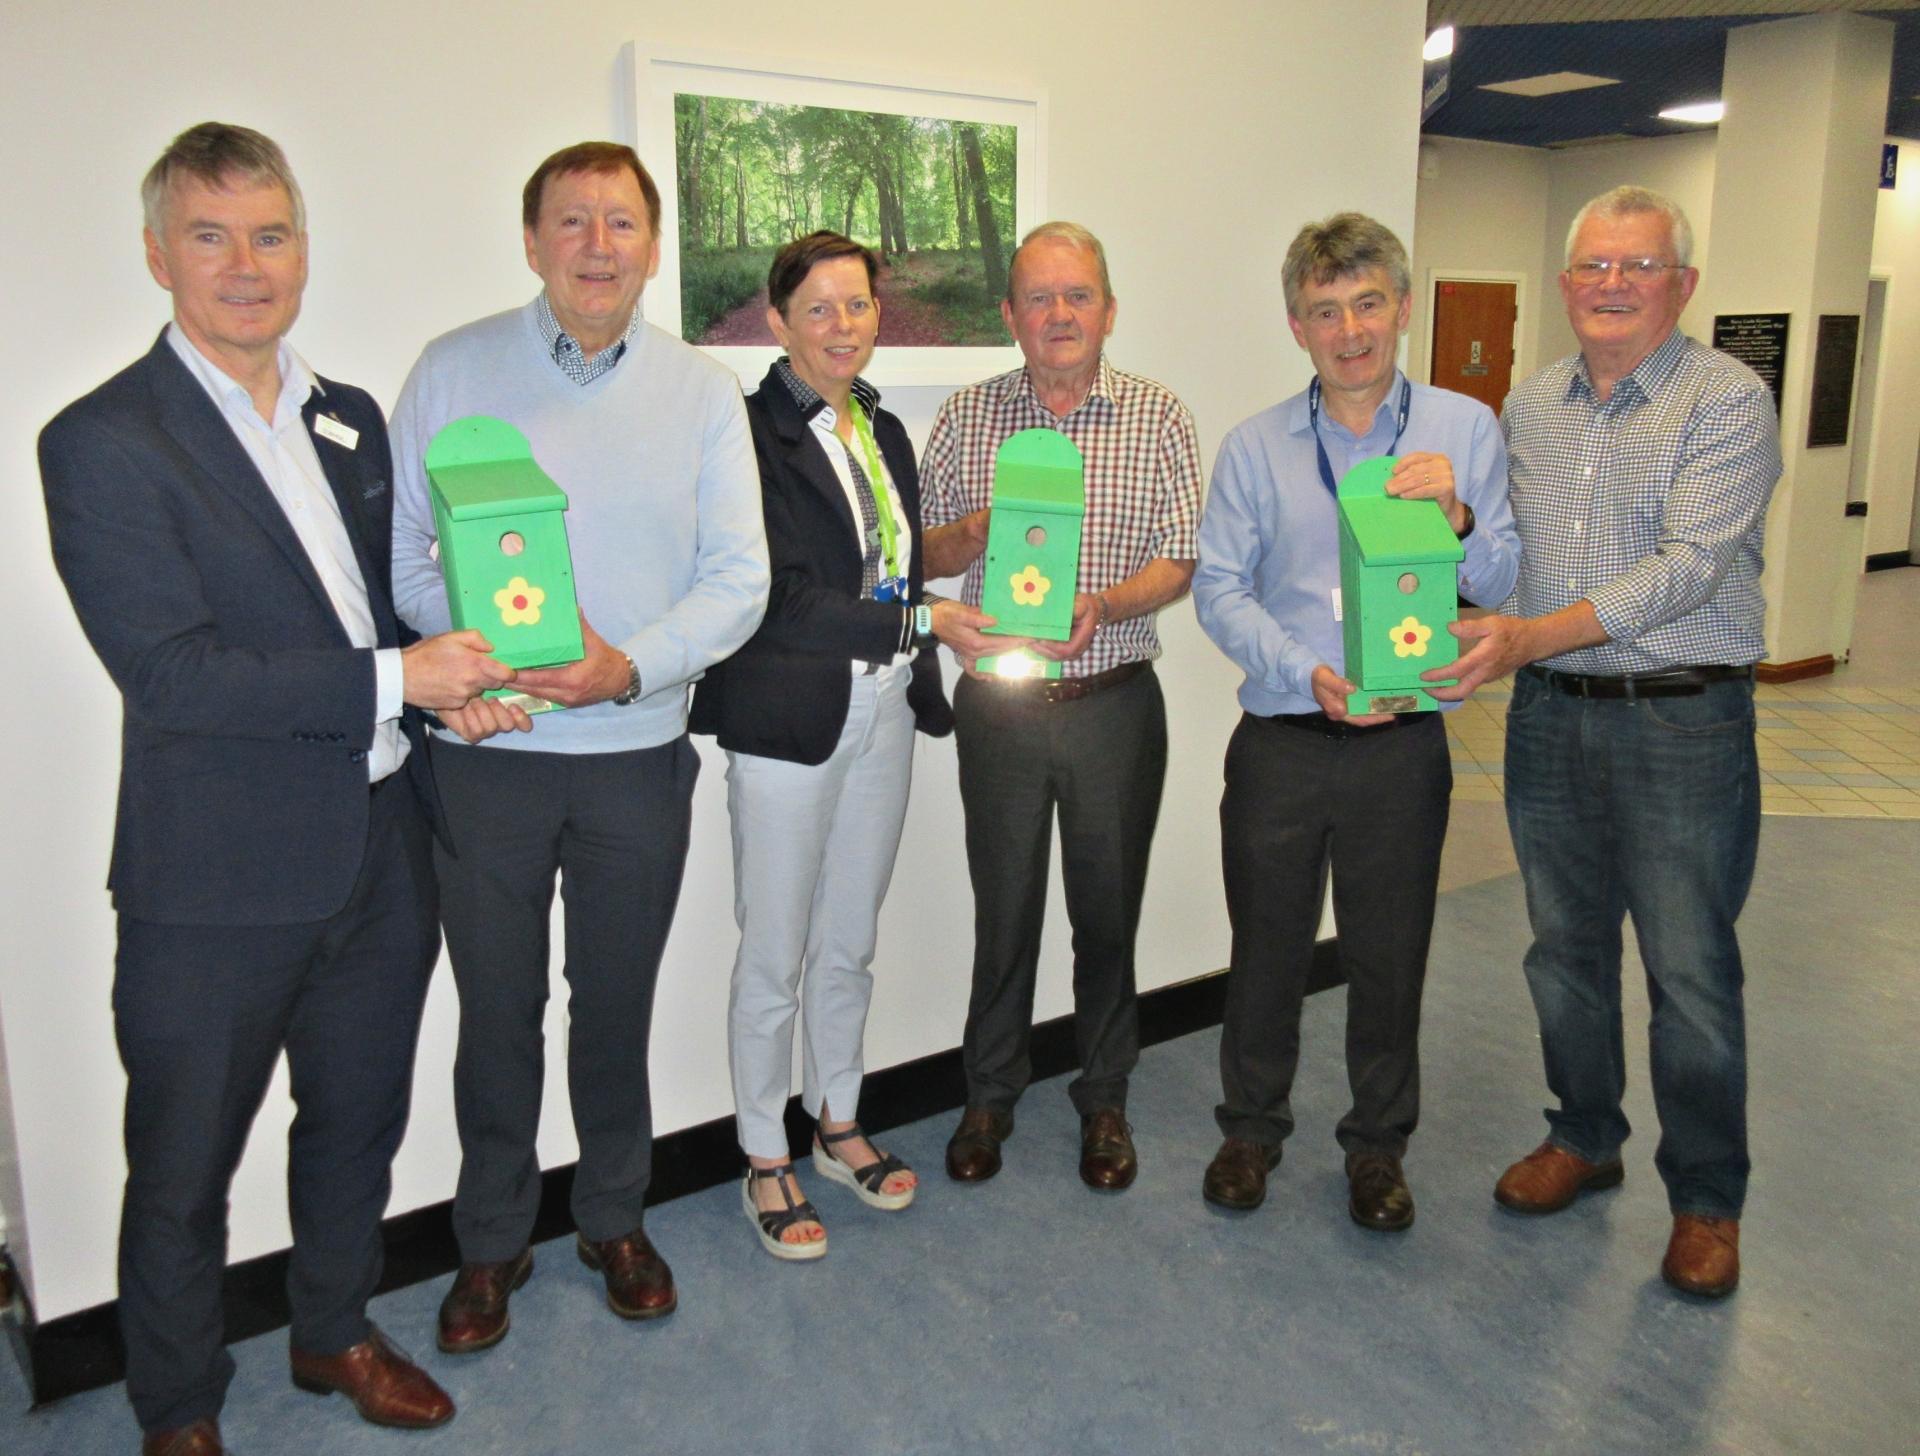 Ballyshannon Men's Shed make donation of bird boxes to Sligo